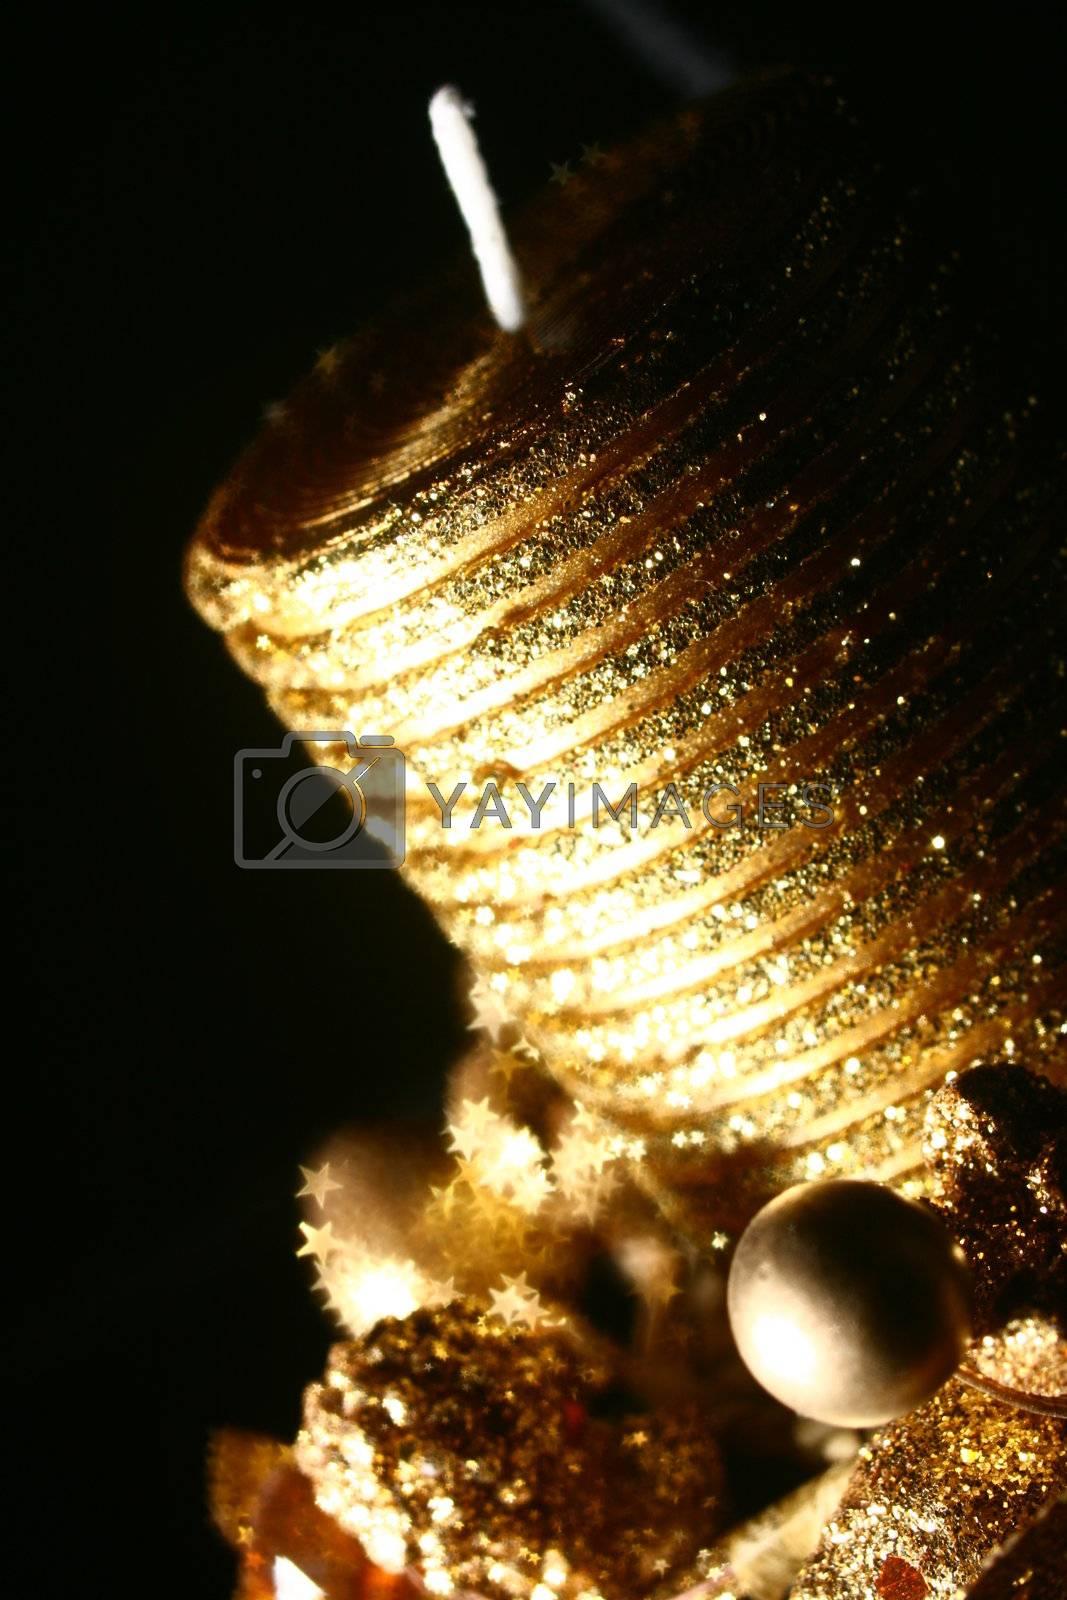 golden stars holiday background macro close up